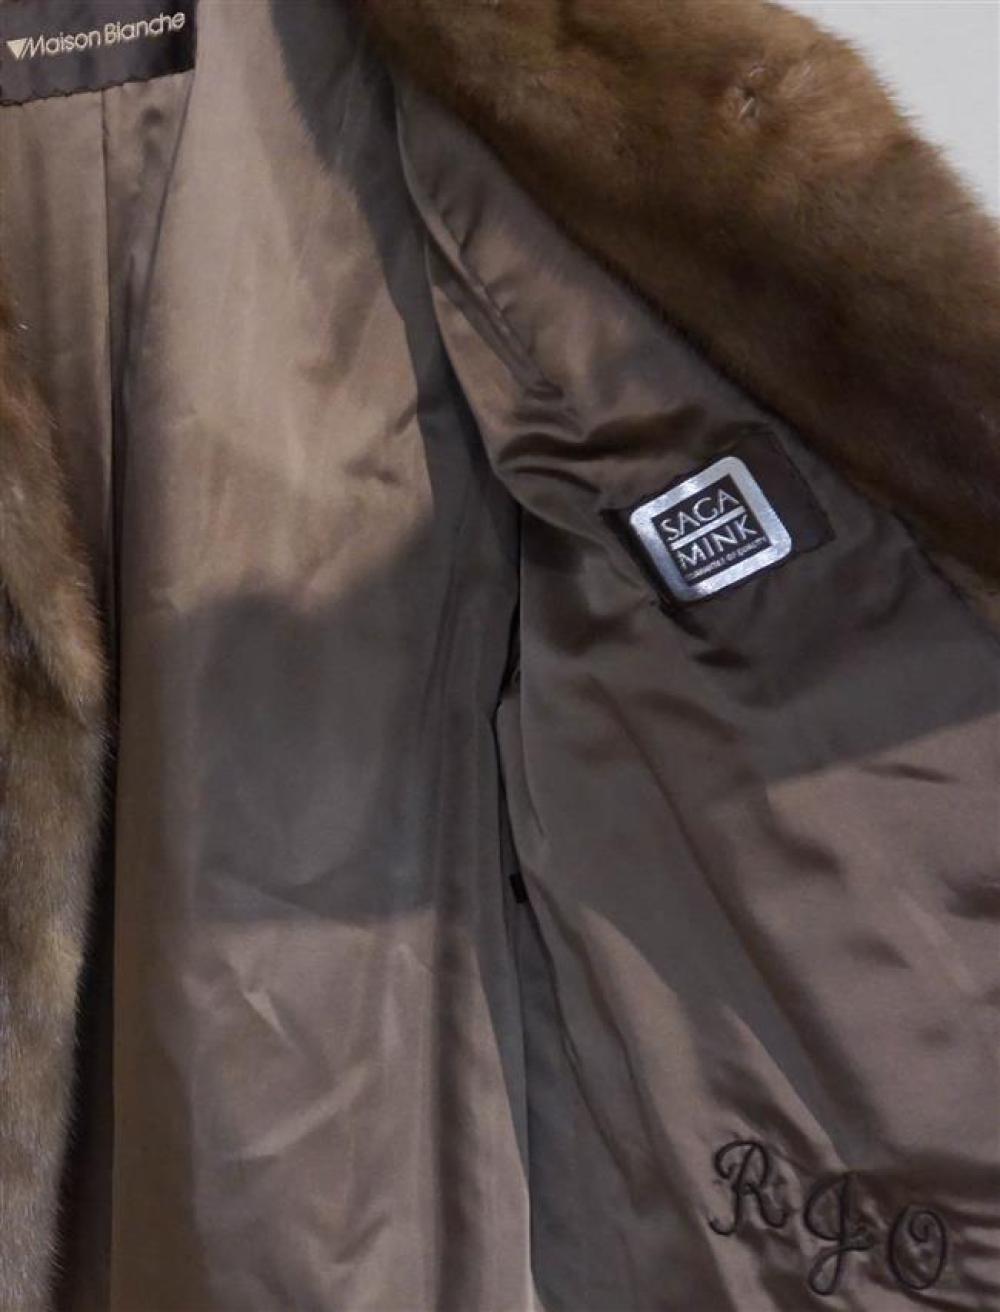 Maison Blanche Hazel Mink Jacket